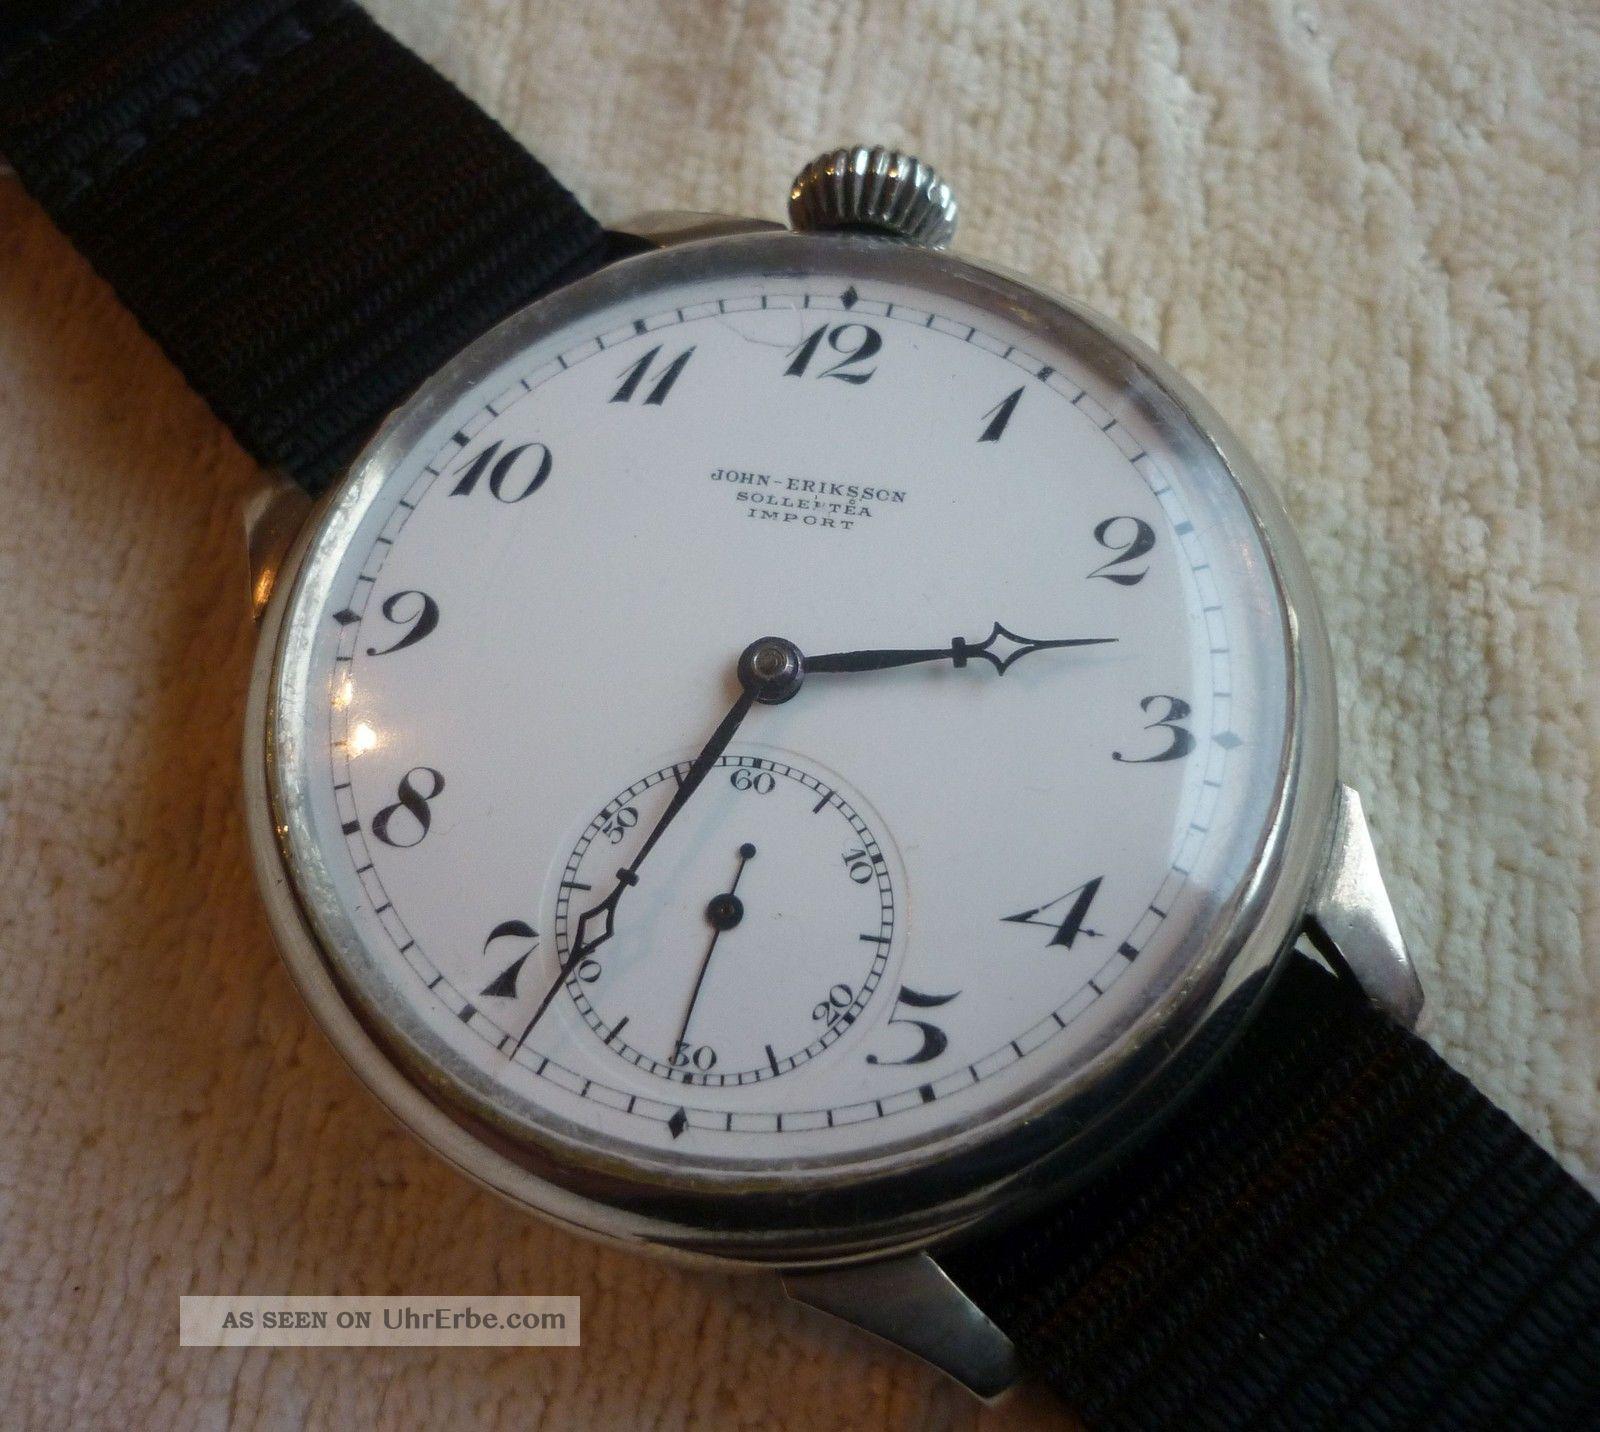 Antike Xxl Omega Armbanduhr John Eriksson Solleftea Import Absolutter Hingucker Armbanduhren Bild